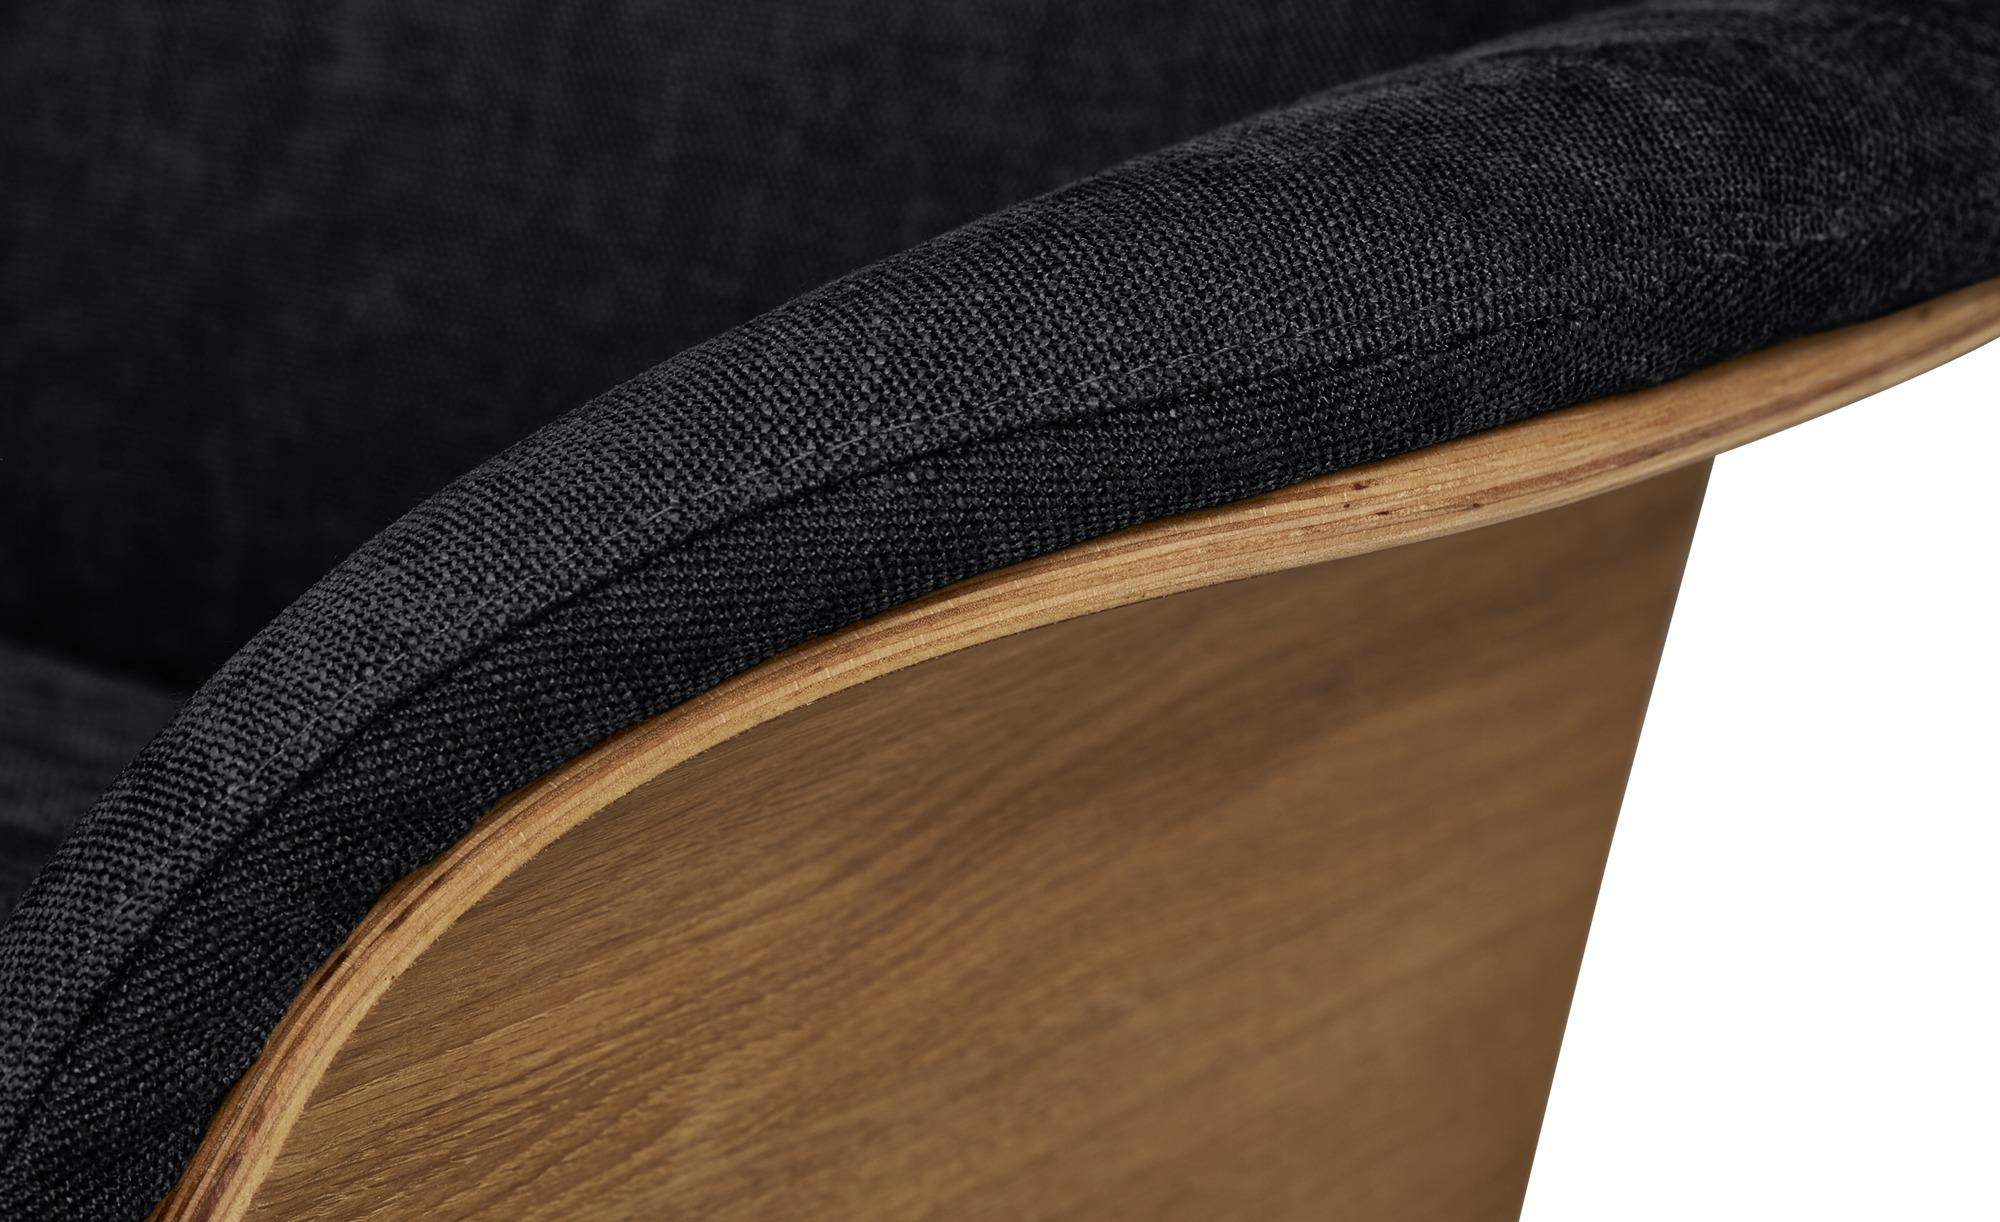 Relaxsessel  Stian ¦ schwarz ¦ Maße (cm): B: 77 H: 116 T: 82 Polstermöbel > Sessel > Fernsehsessel - Höffner